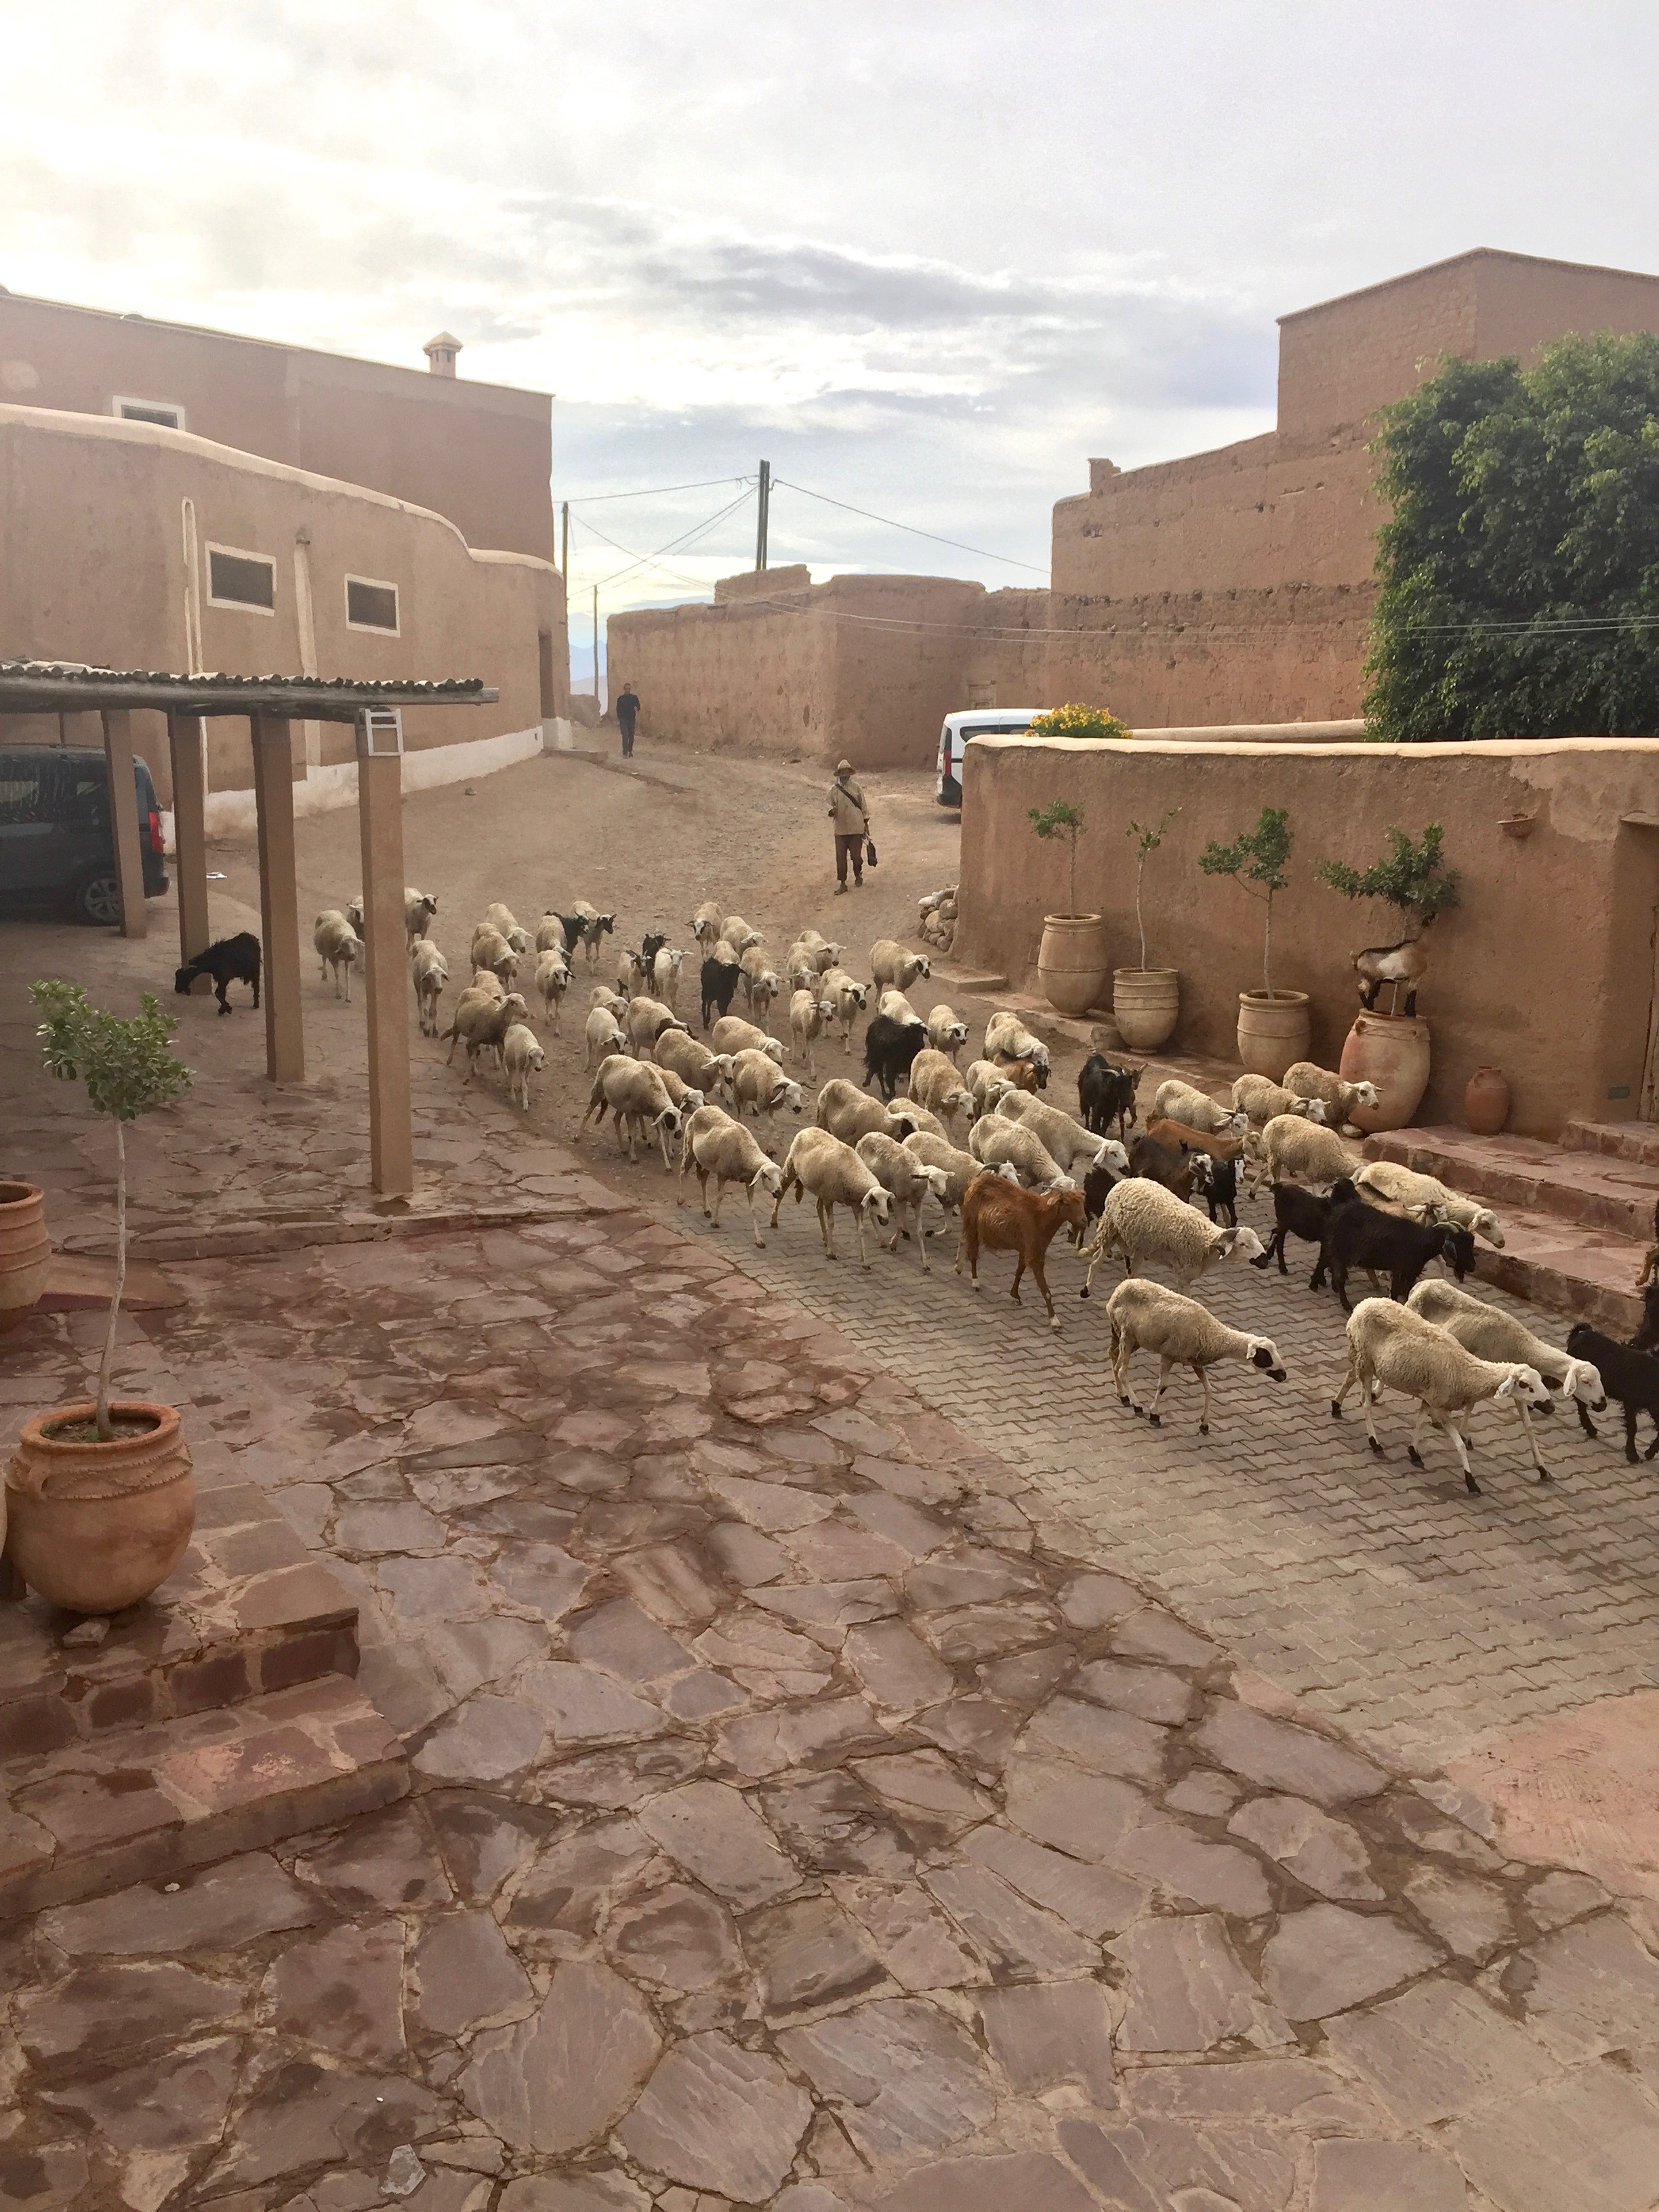 A berber village outside Marrakech